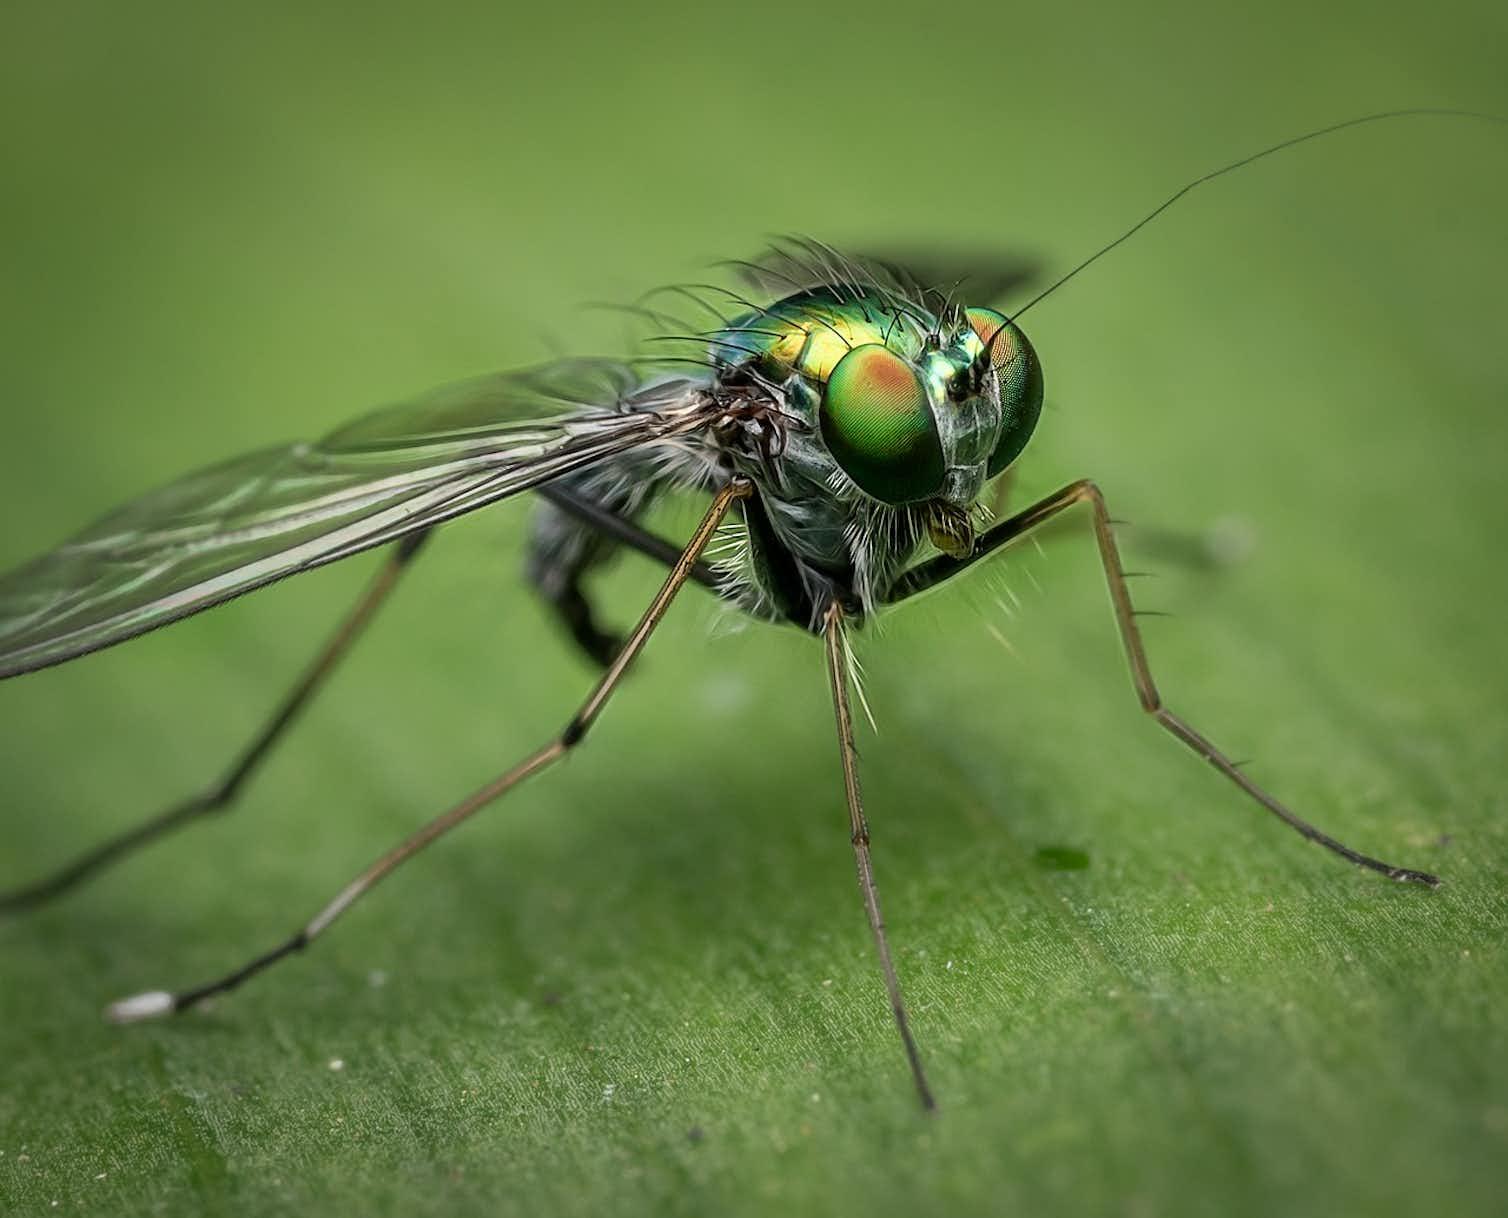 Our natural world depends on arthropods. Photo credit: Steve Raubenstine/Pixabay